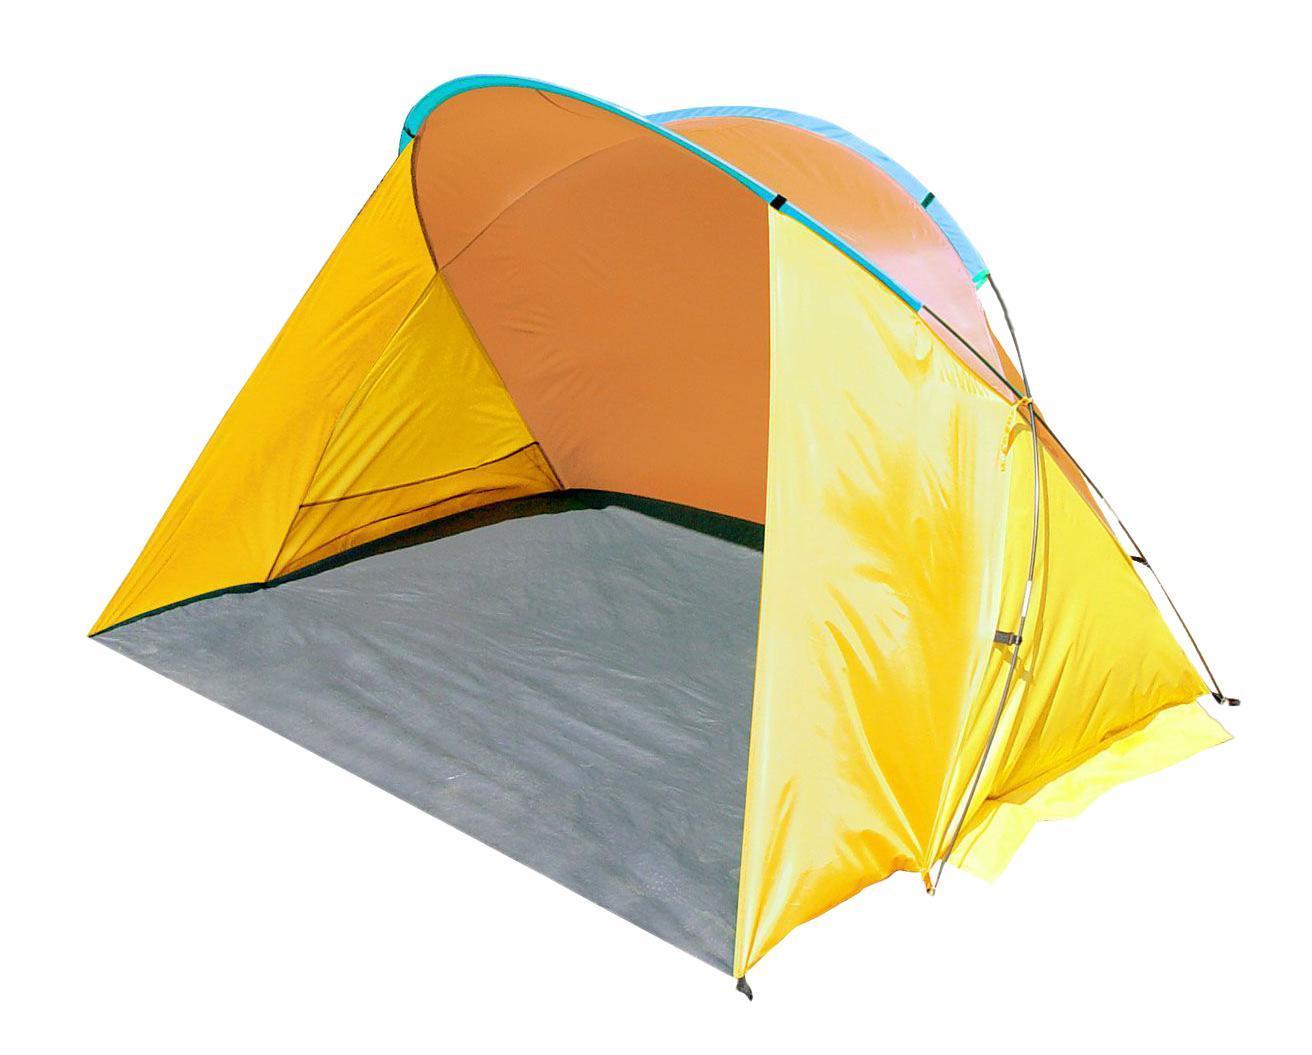 "Тент пляжный TREK PLANET ""Miami Beach"", цвет: желтый, оранжевый, 200 см х 150 см х 125 см"